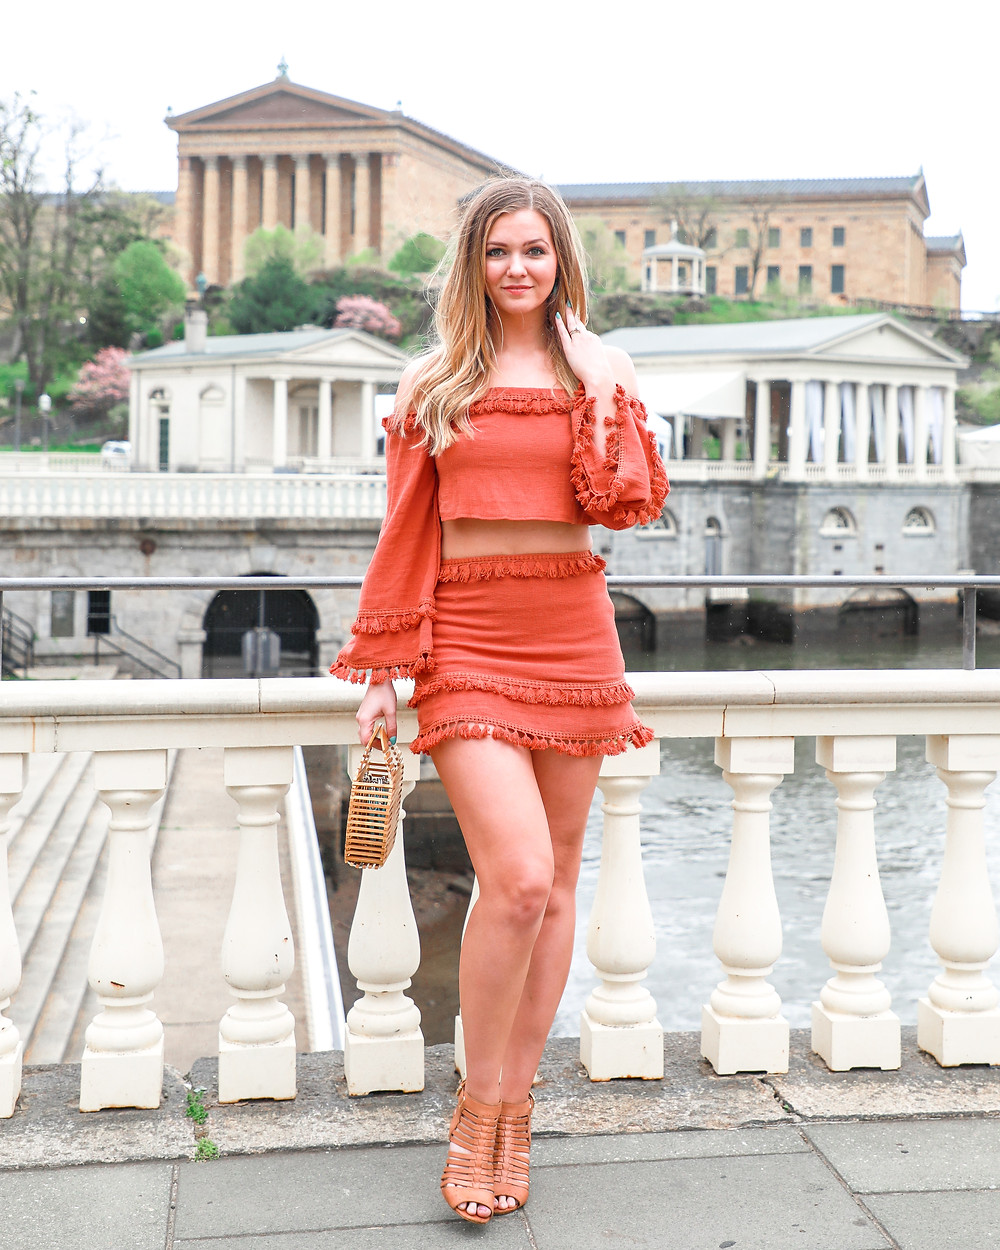 fashion blogger photoshoot, Sommer Photo Co, Philadelphia